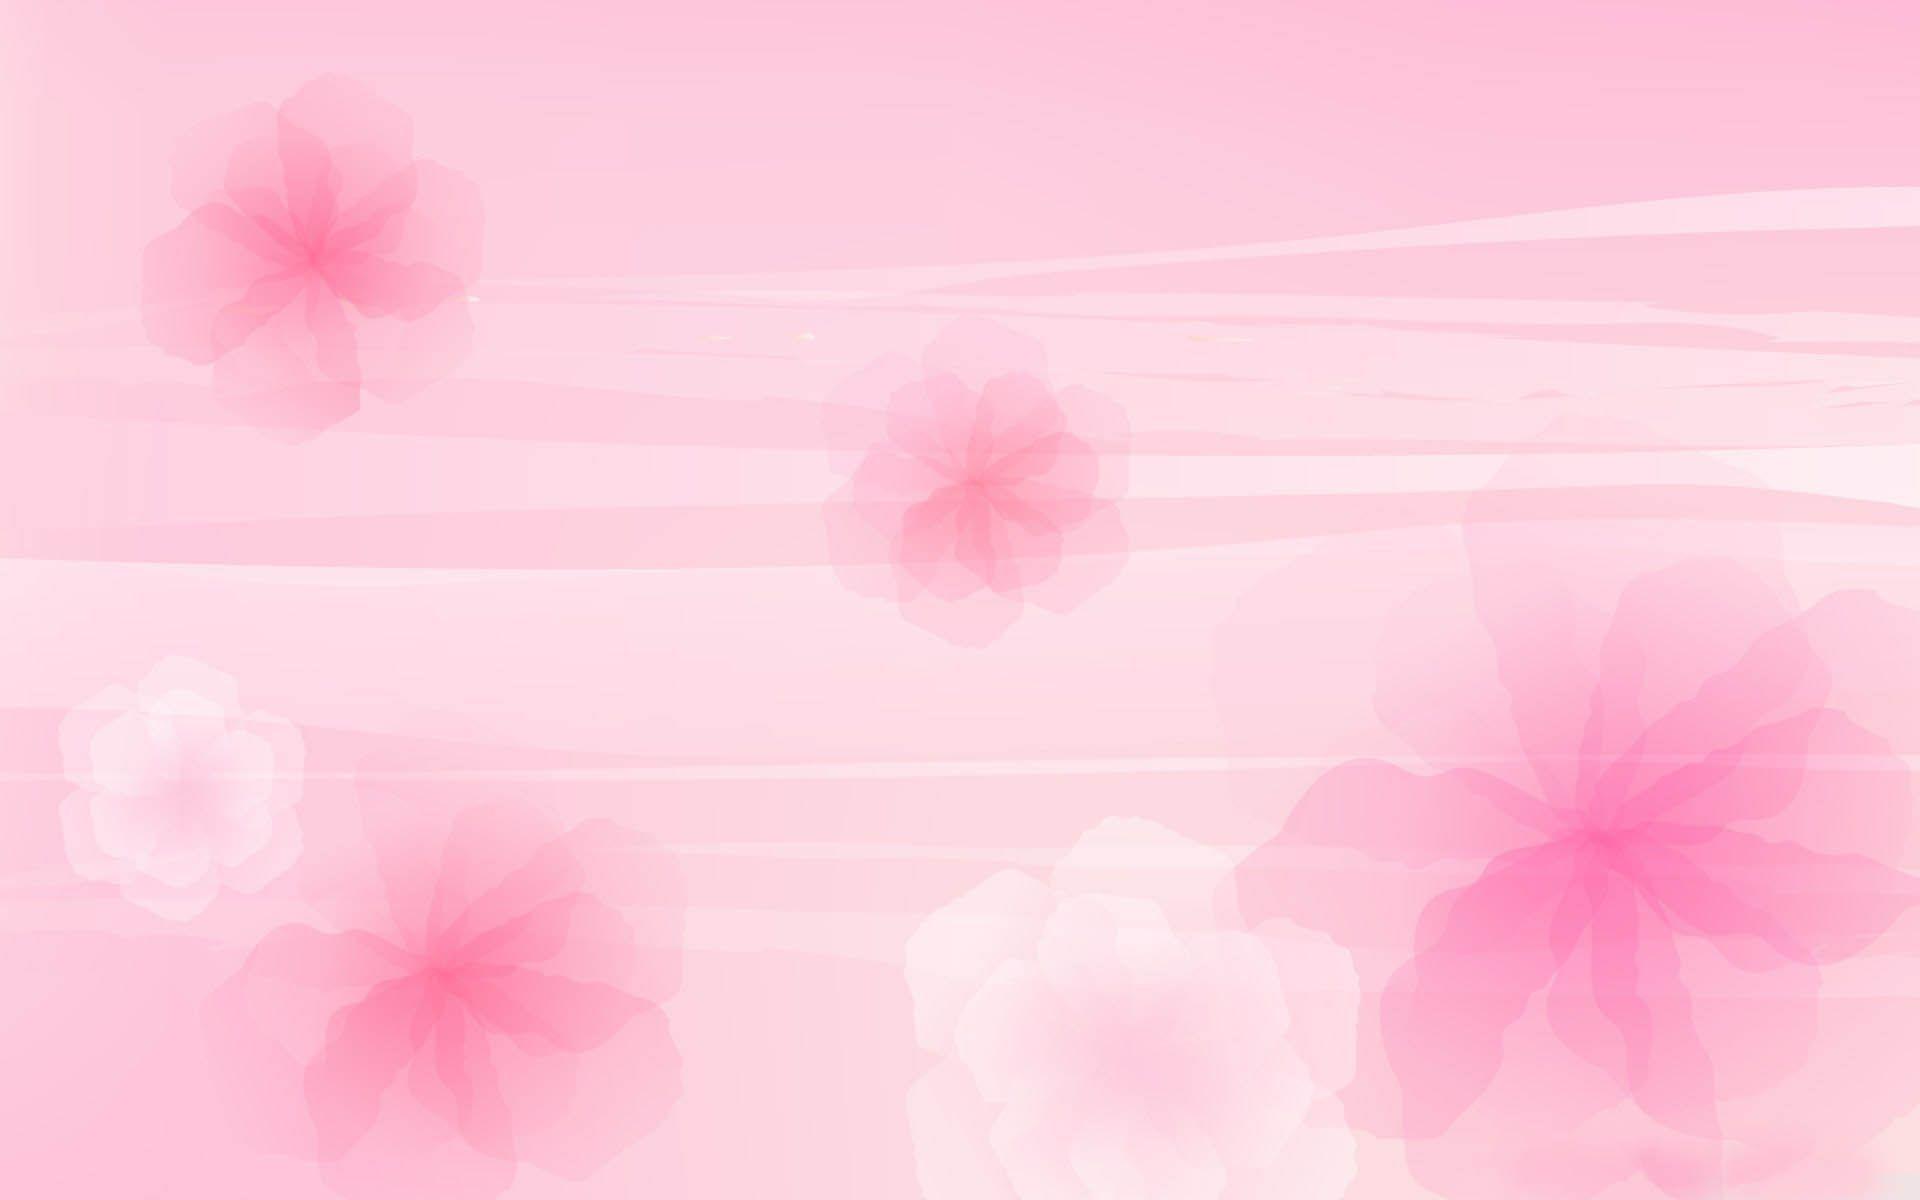 Background Flowers Pinkg 19201200 Art Pinterest